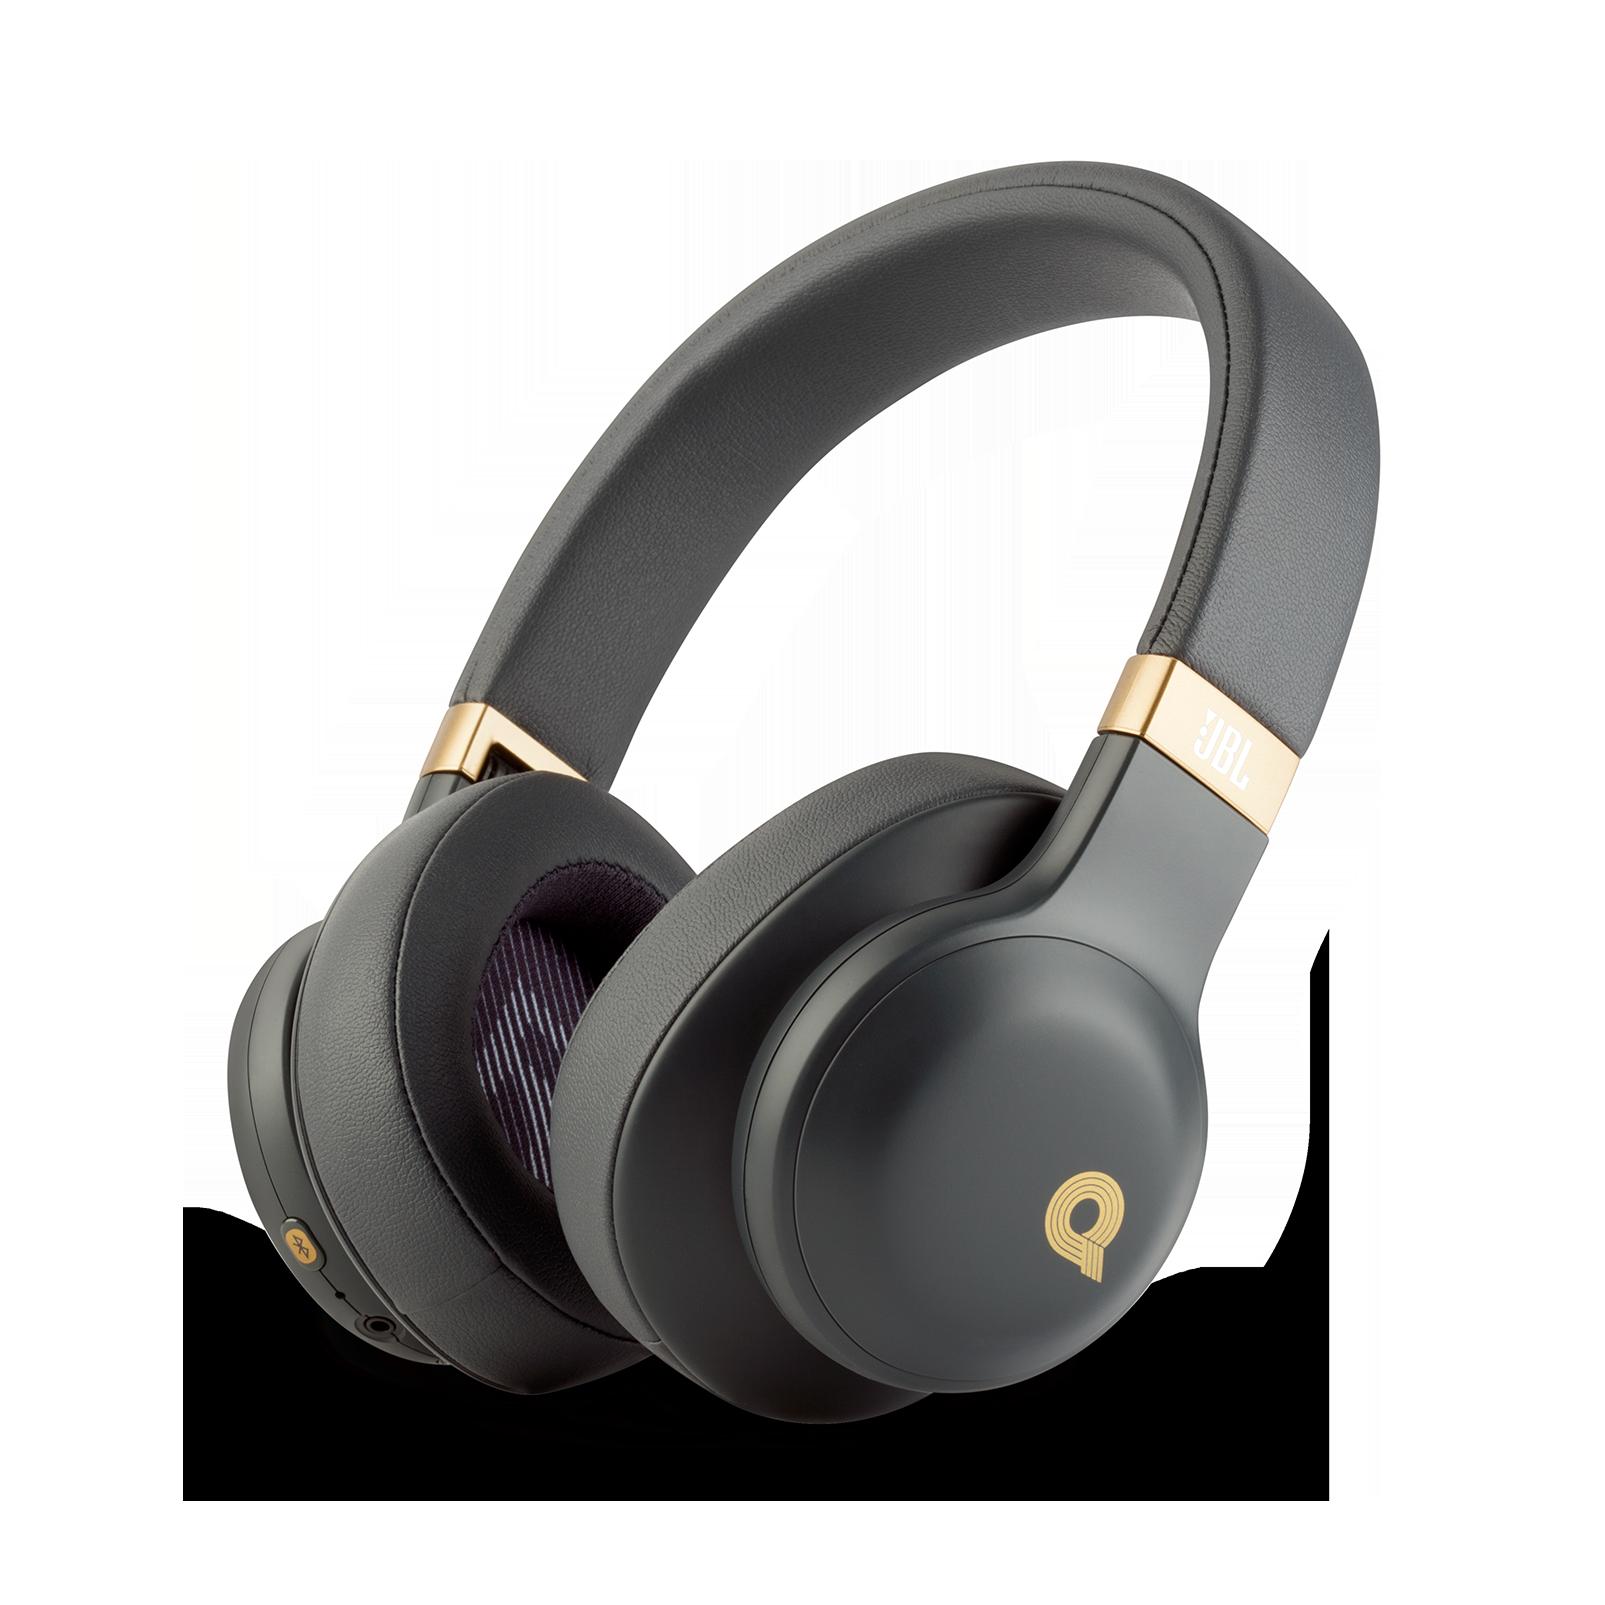 JBL E55BT | Wireless over ear headphones